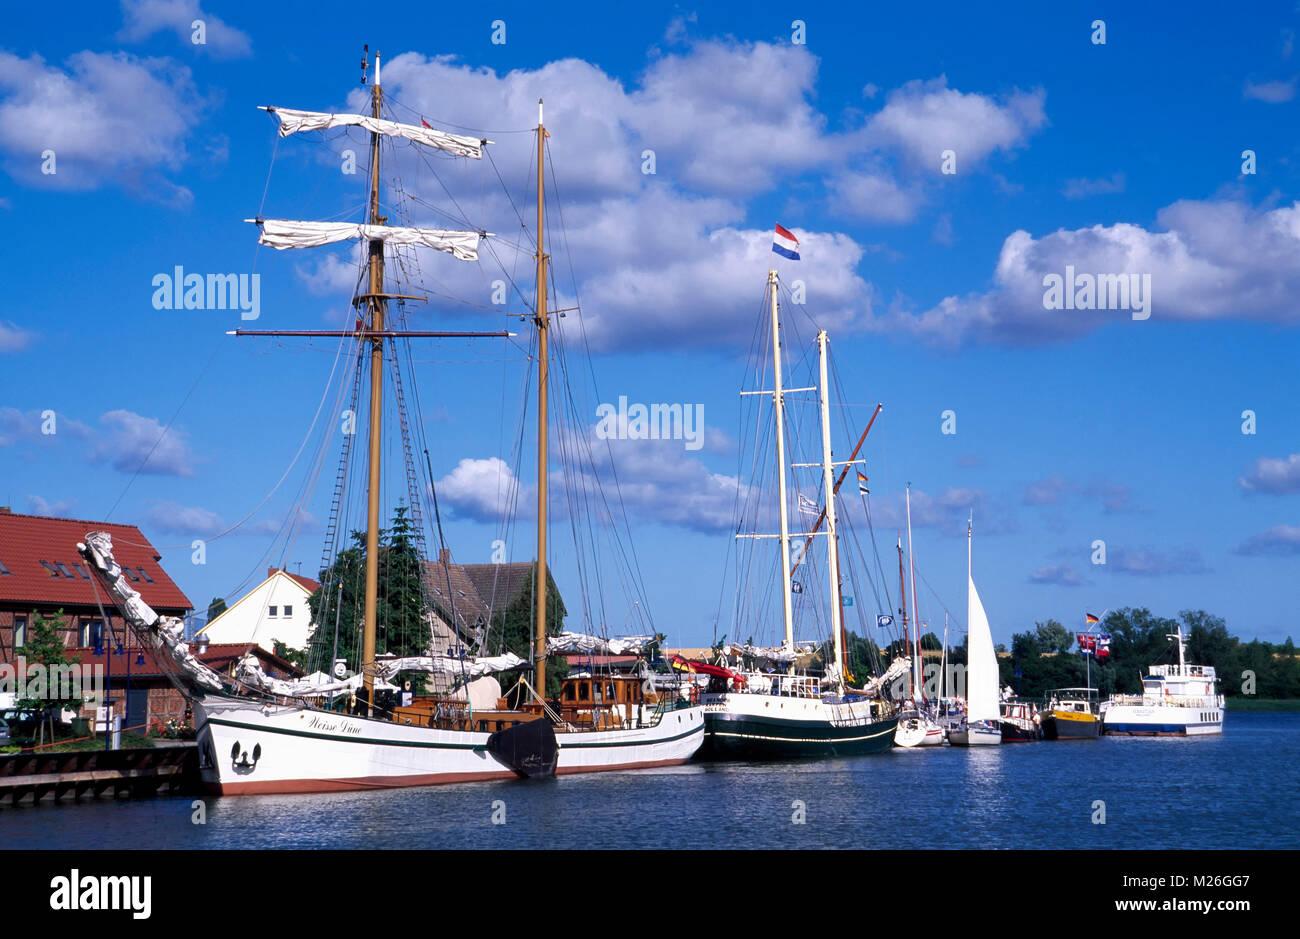 Wolgast, sailing ships in the harbor, Usedom island, Mecklenburg Western Pomerania, Germany - Stock Image